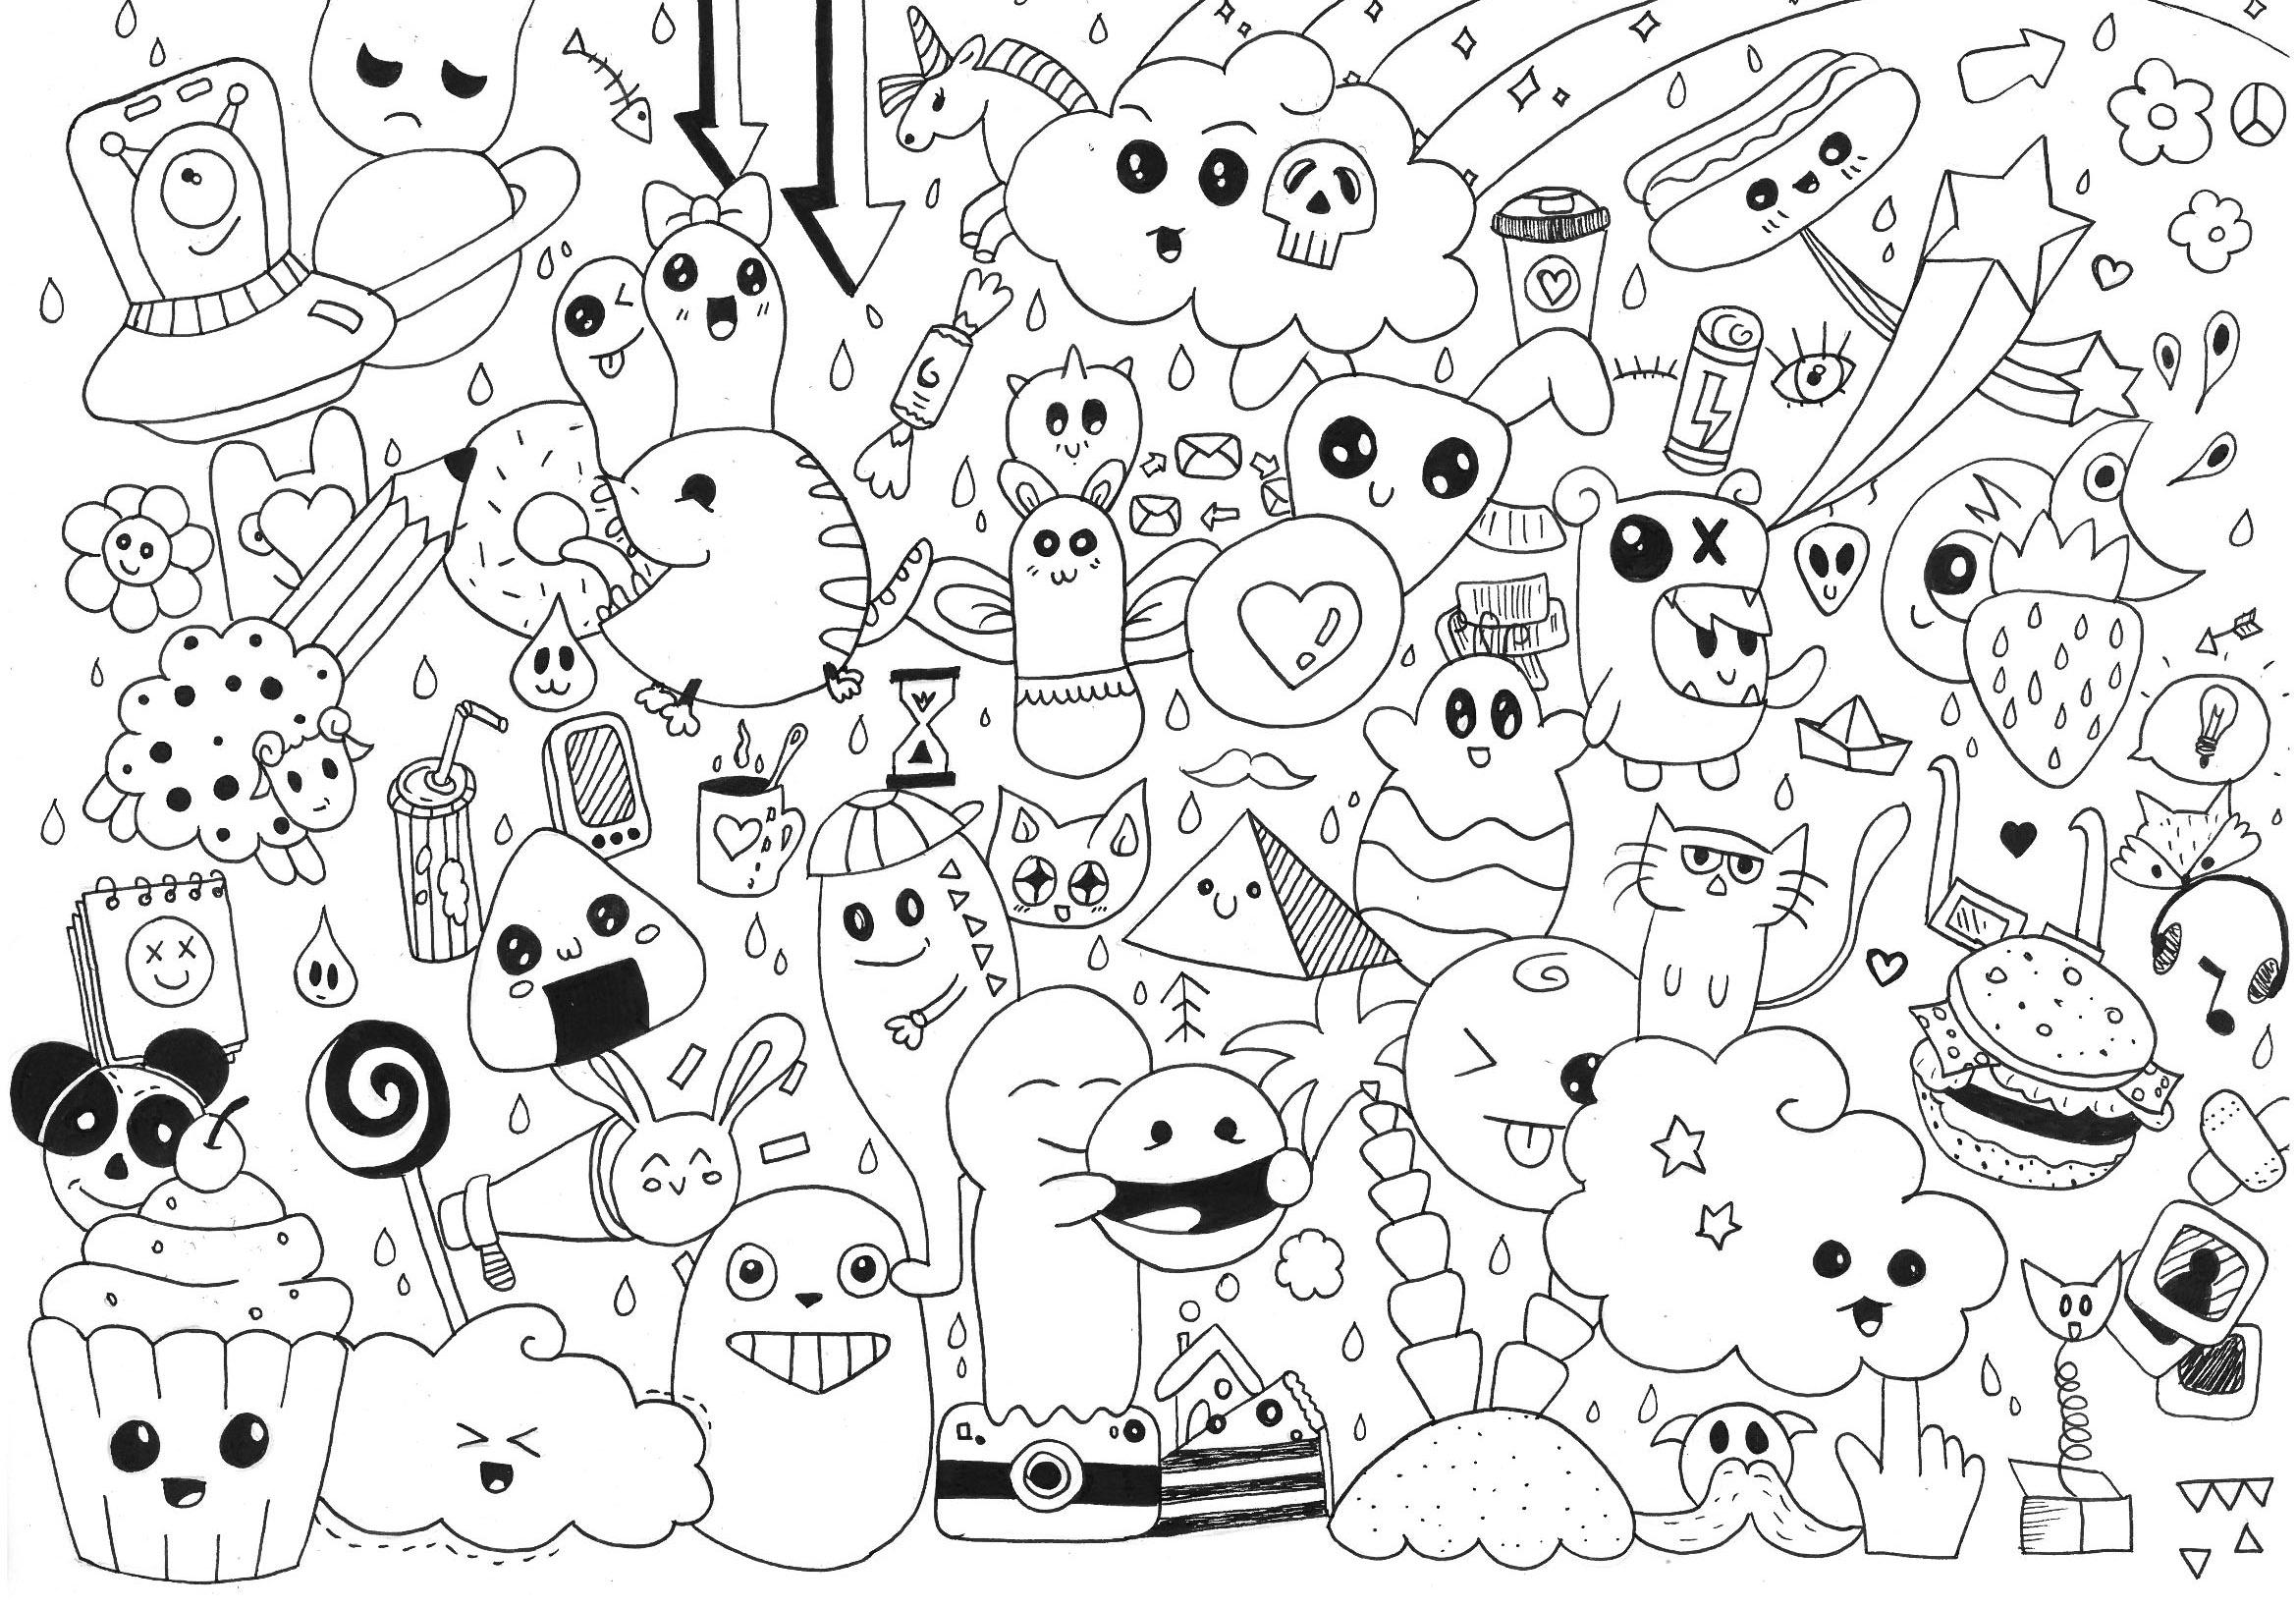 Doodle Art Doodling 55254 Doodle Art Doodling Disegni Da